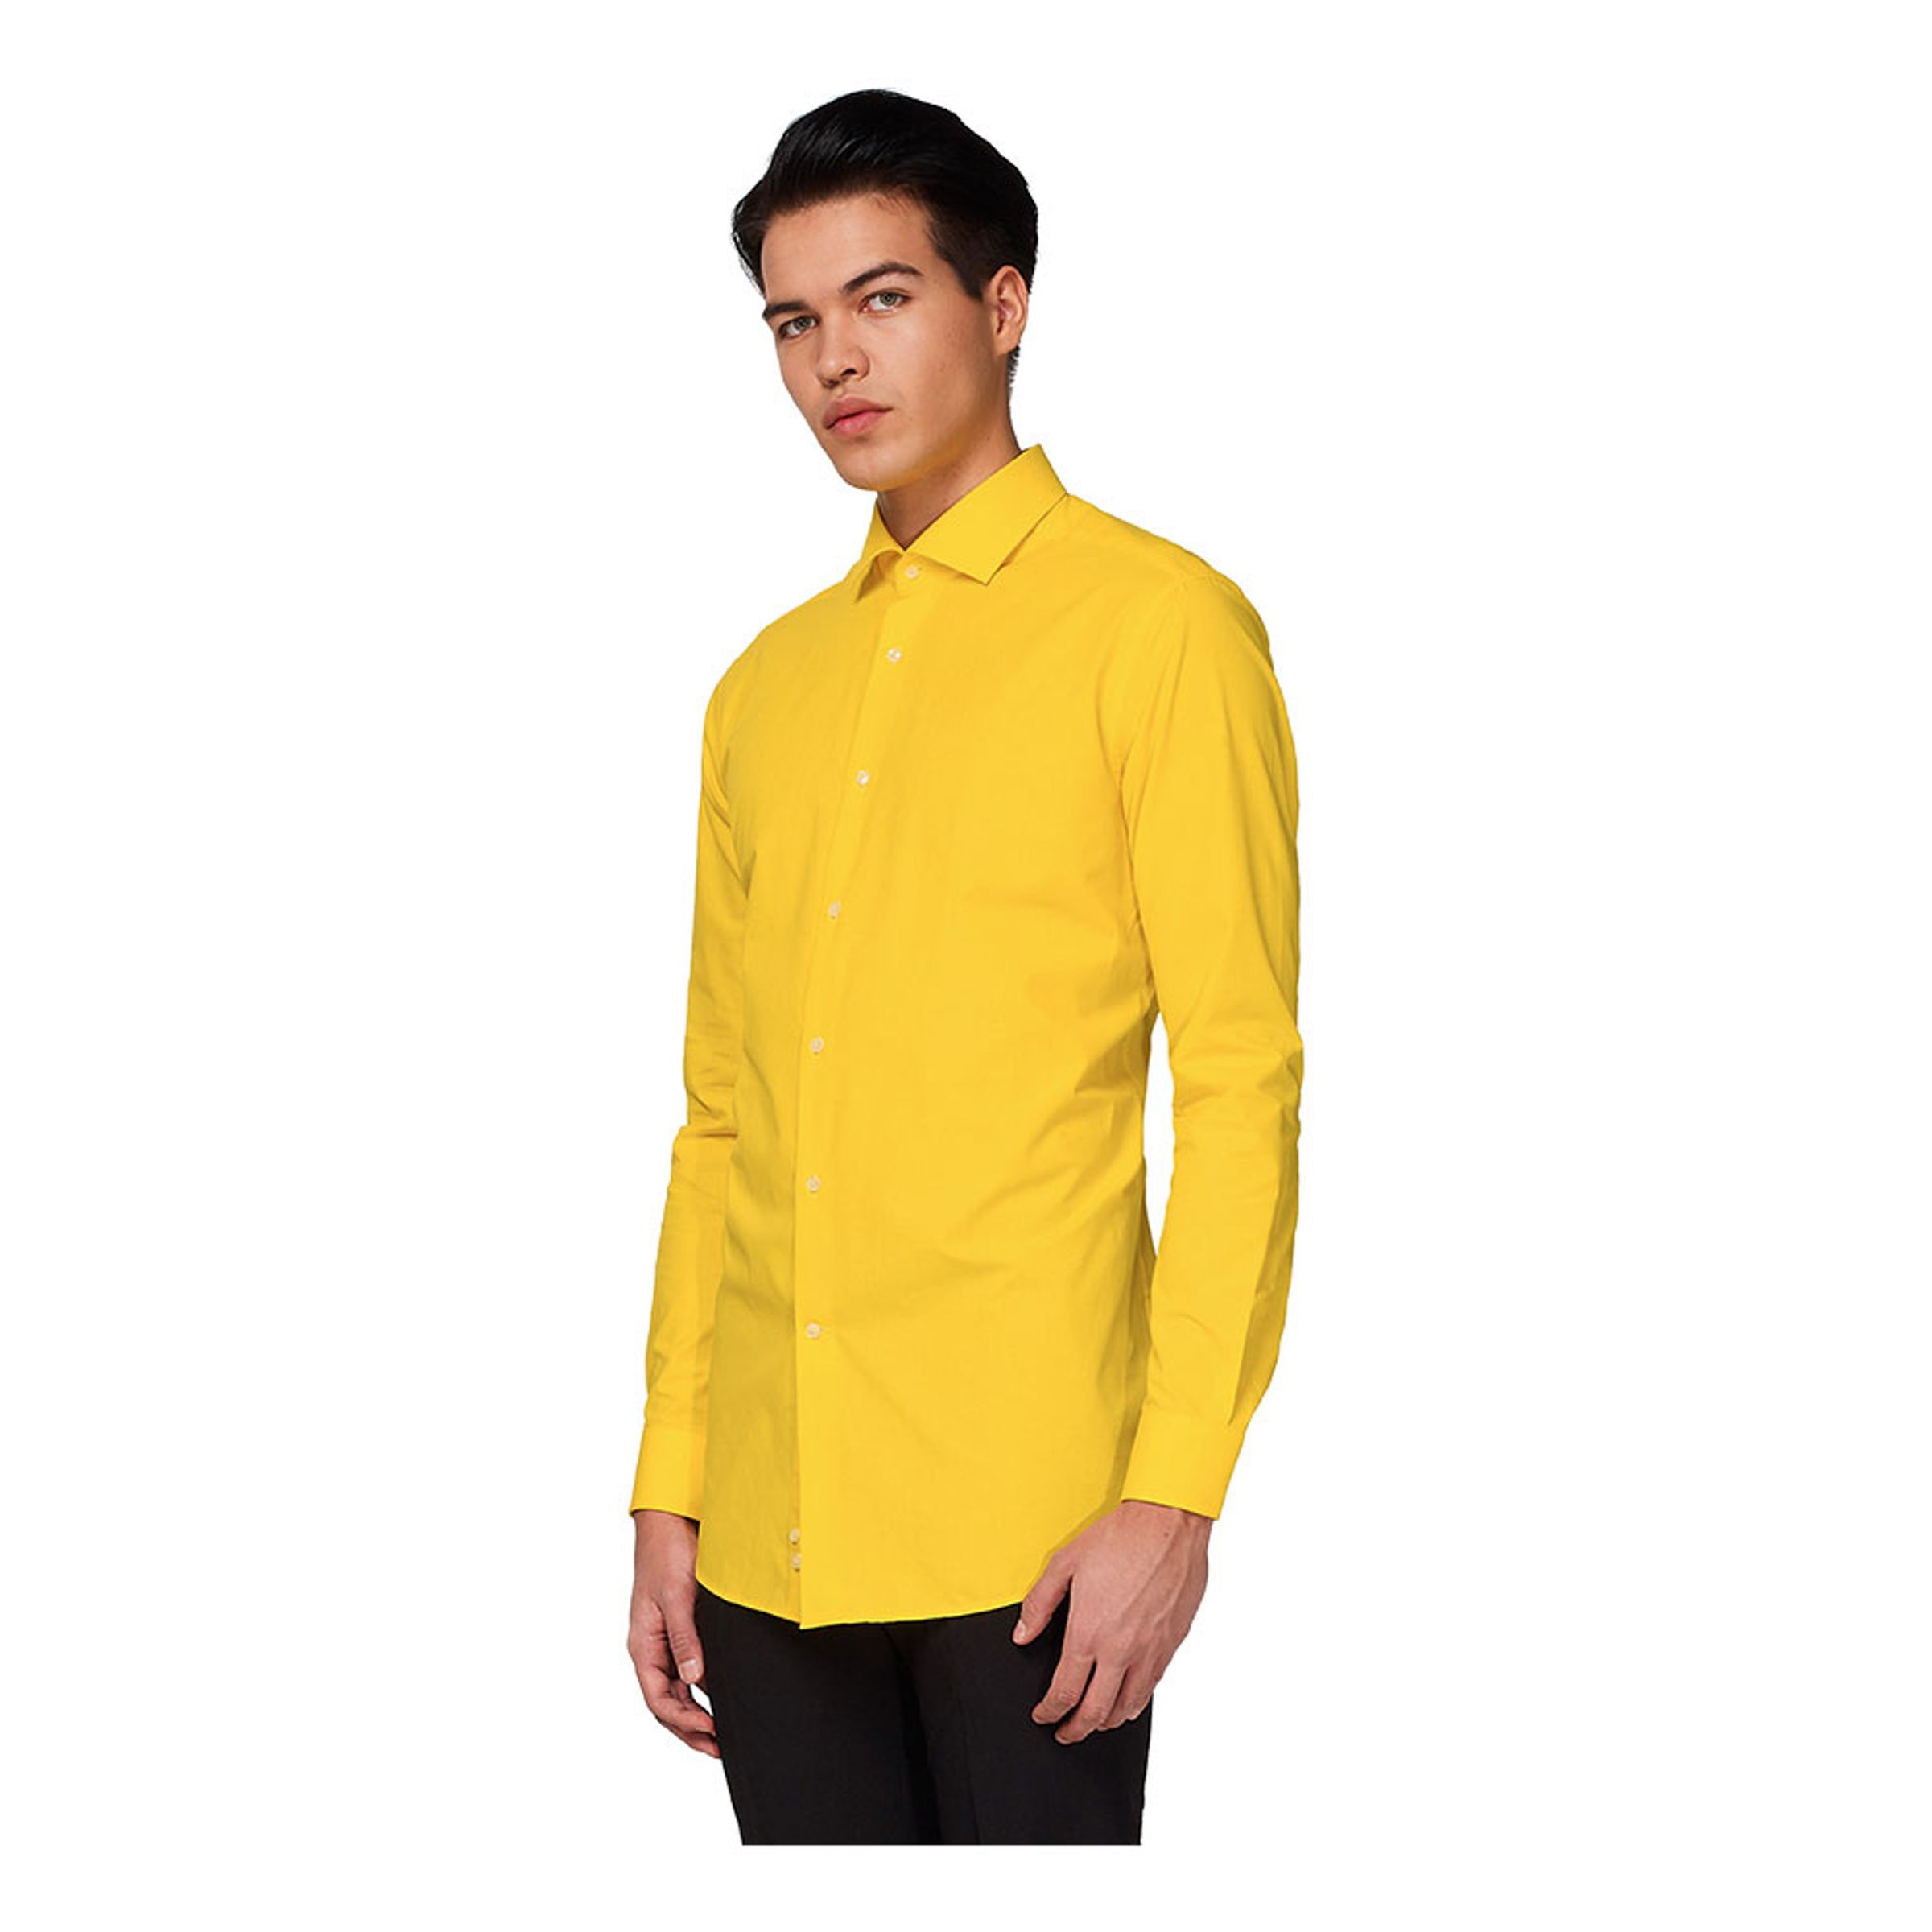 OppoSuits Yellow Fellow Skjorta - 47/48